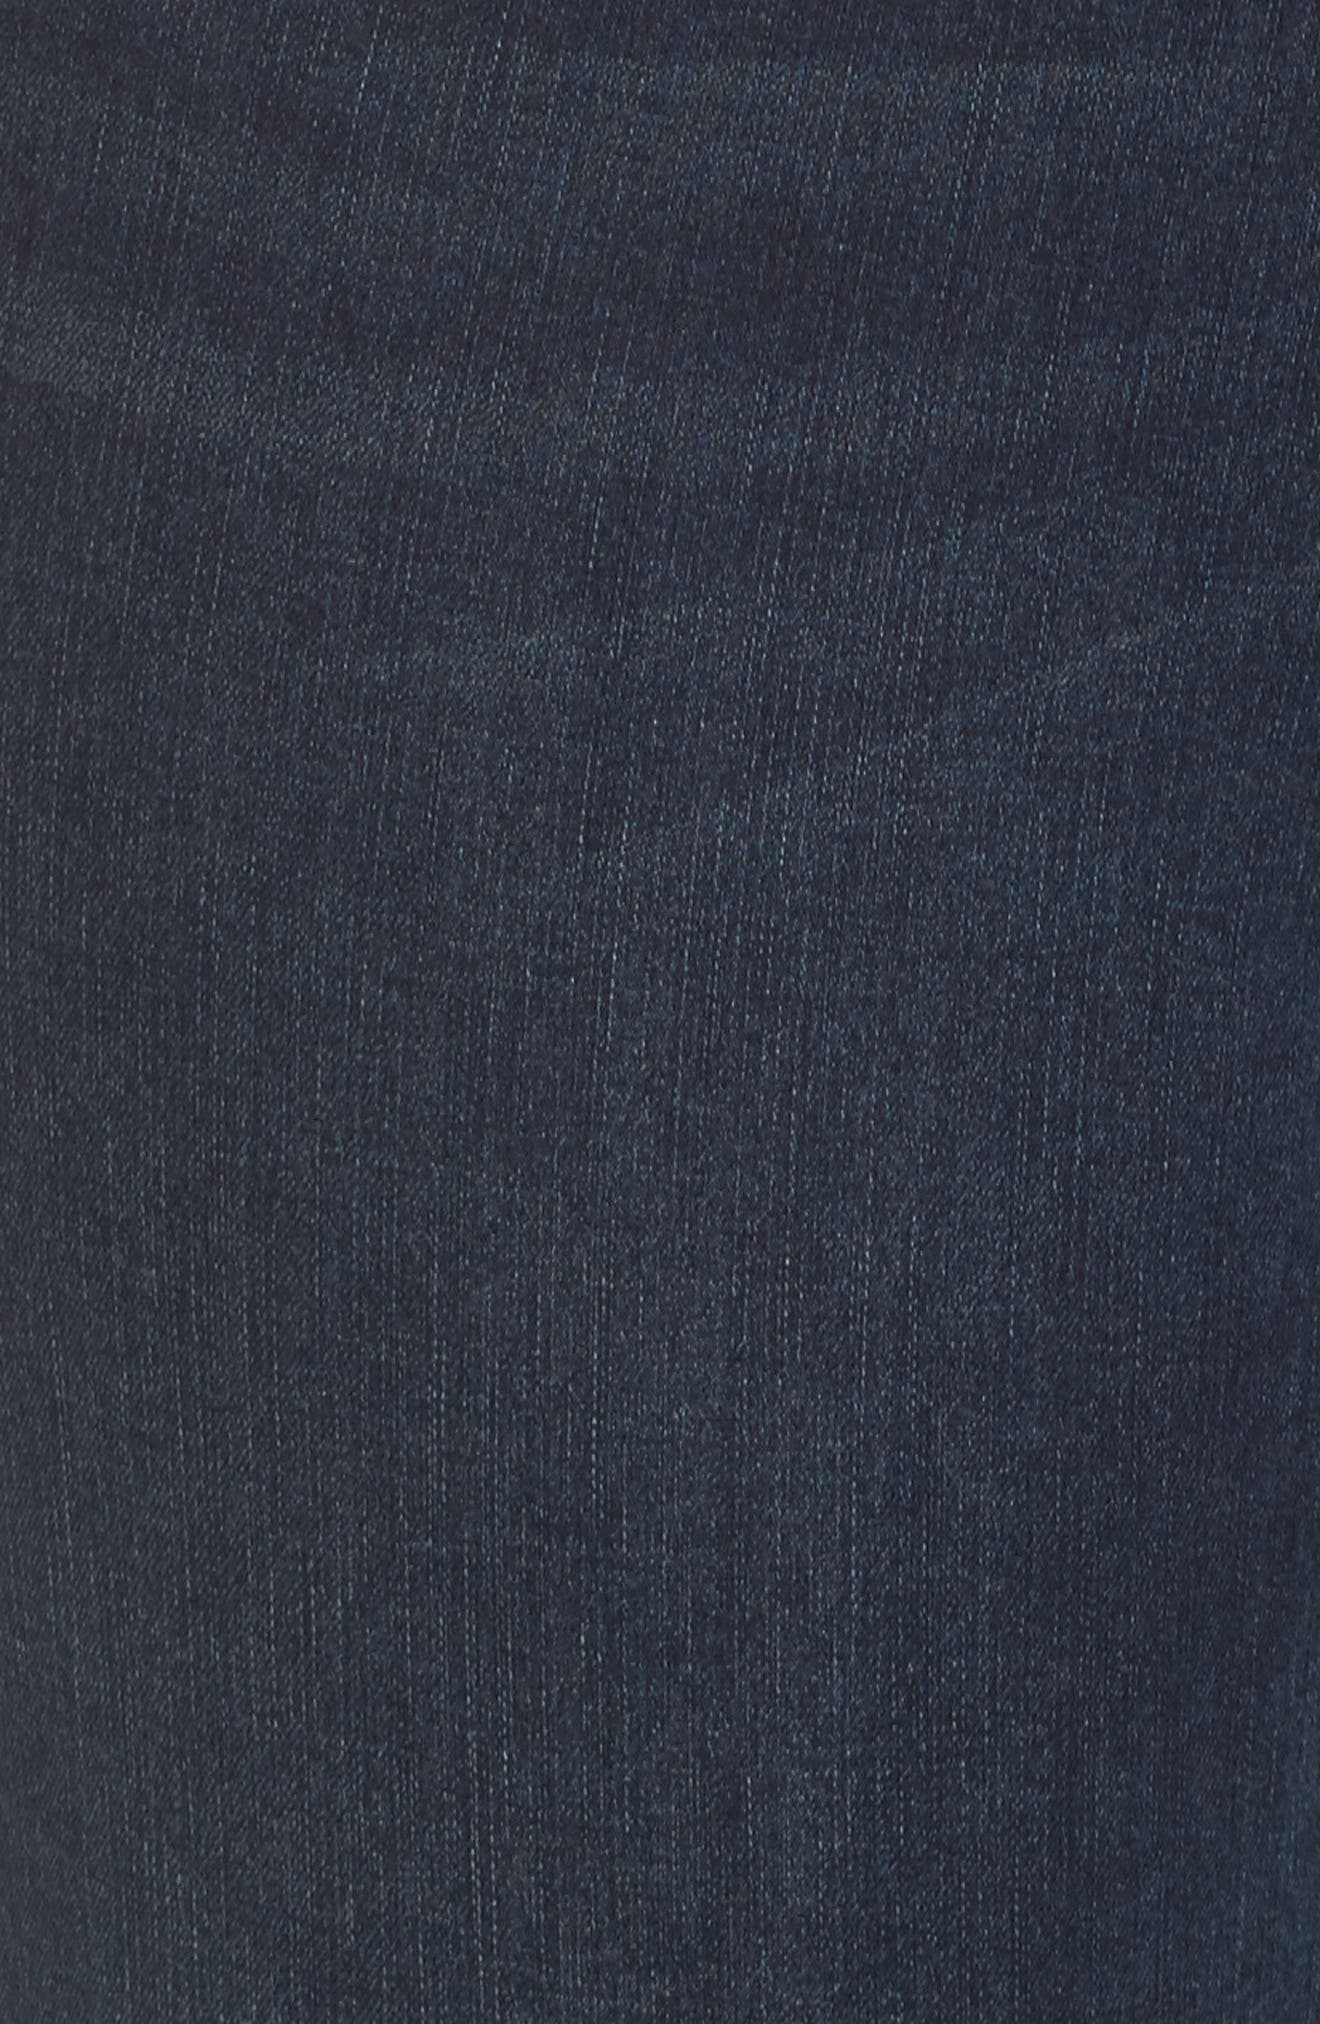 Snap Hem Pencil Jeans,                             Alternate thumbnail 5, color,                             408